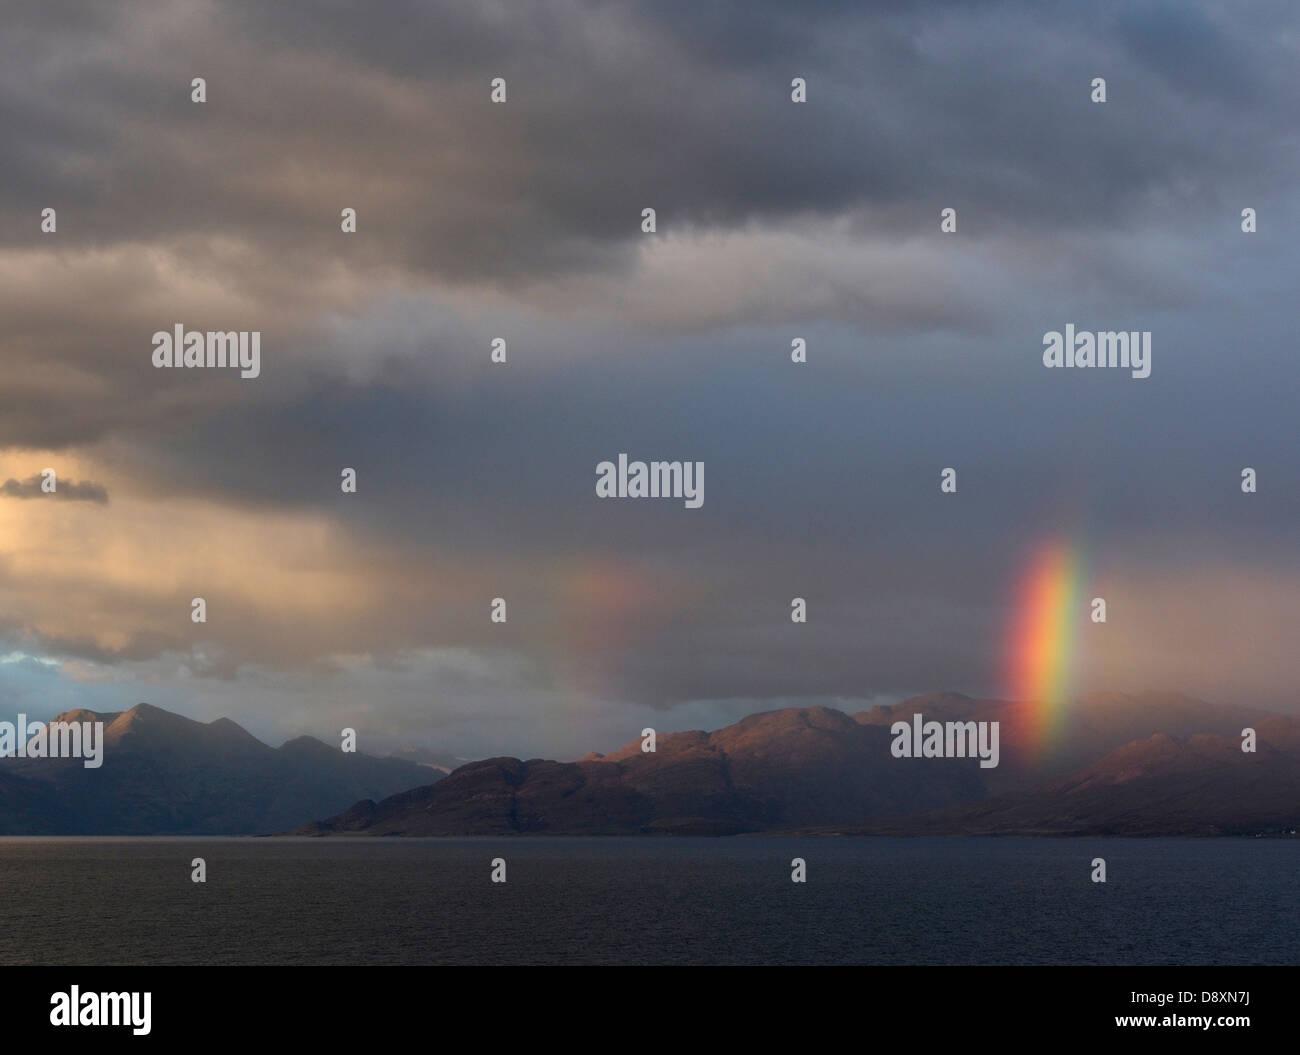 Rainbow over Knoydart from Sabhal Mor Ostaig, Sleat peninsula, Skye, Scotland Stock Photo